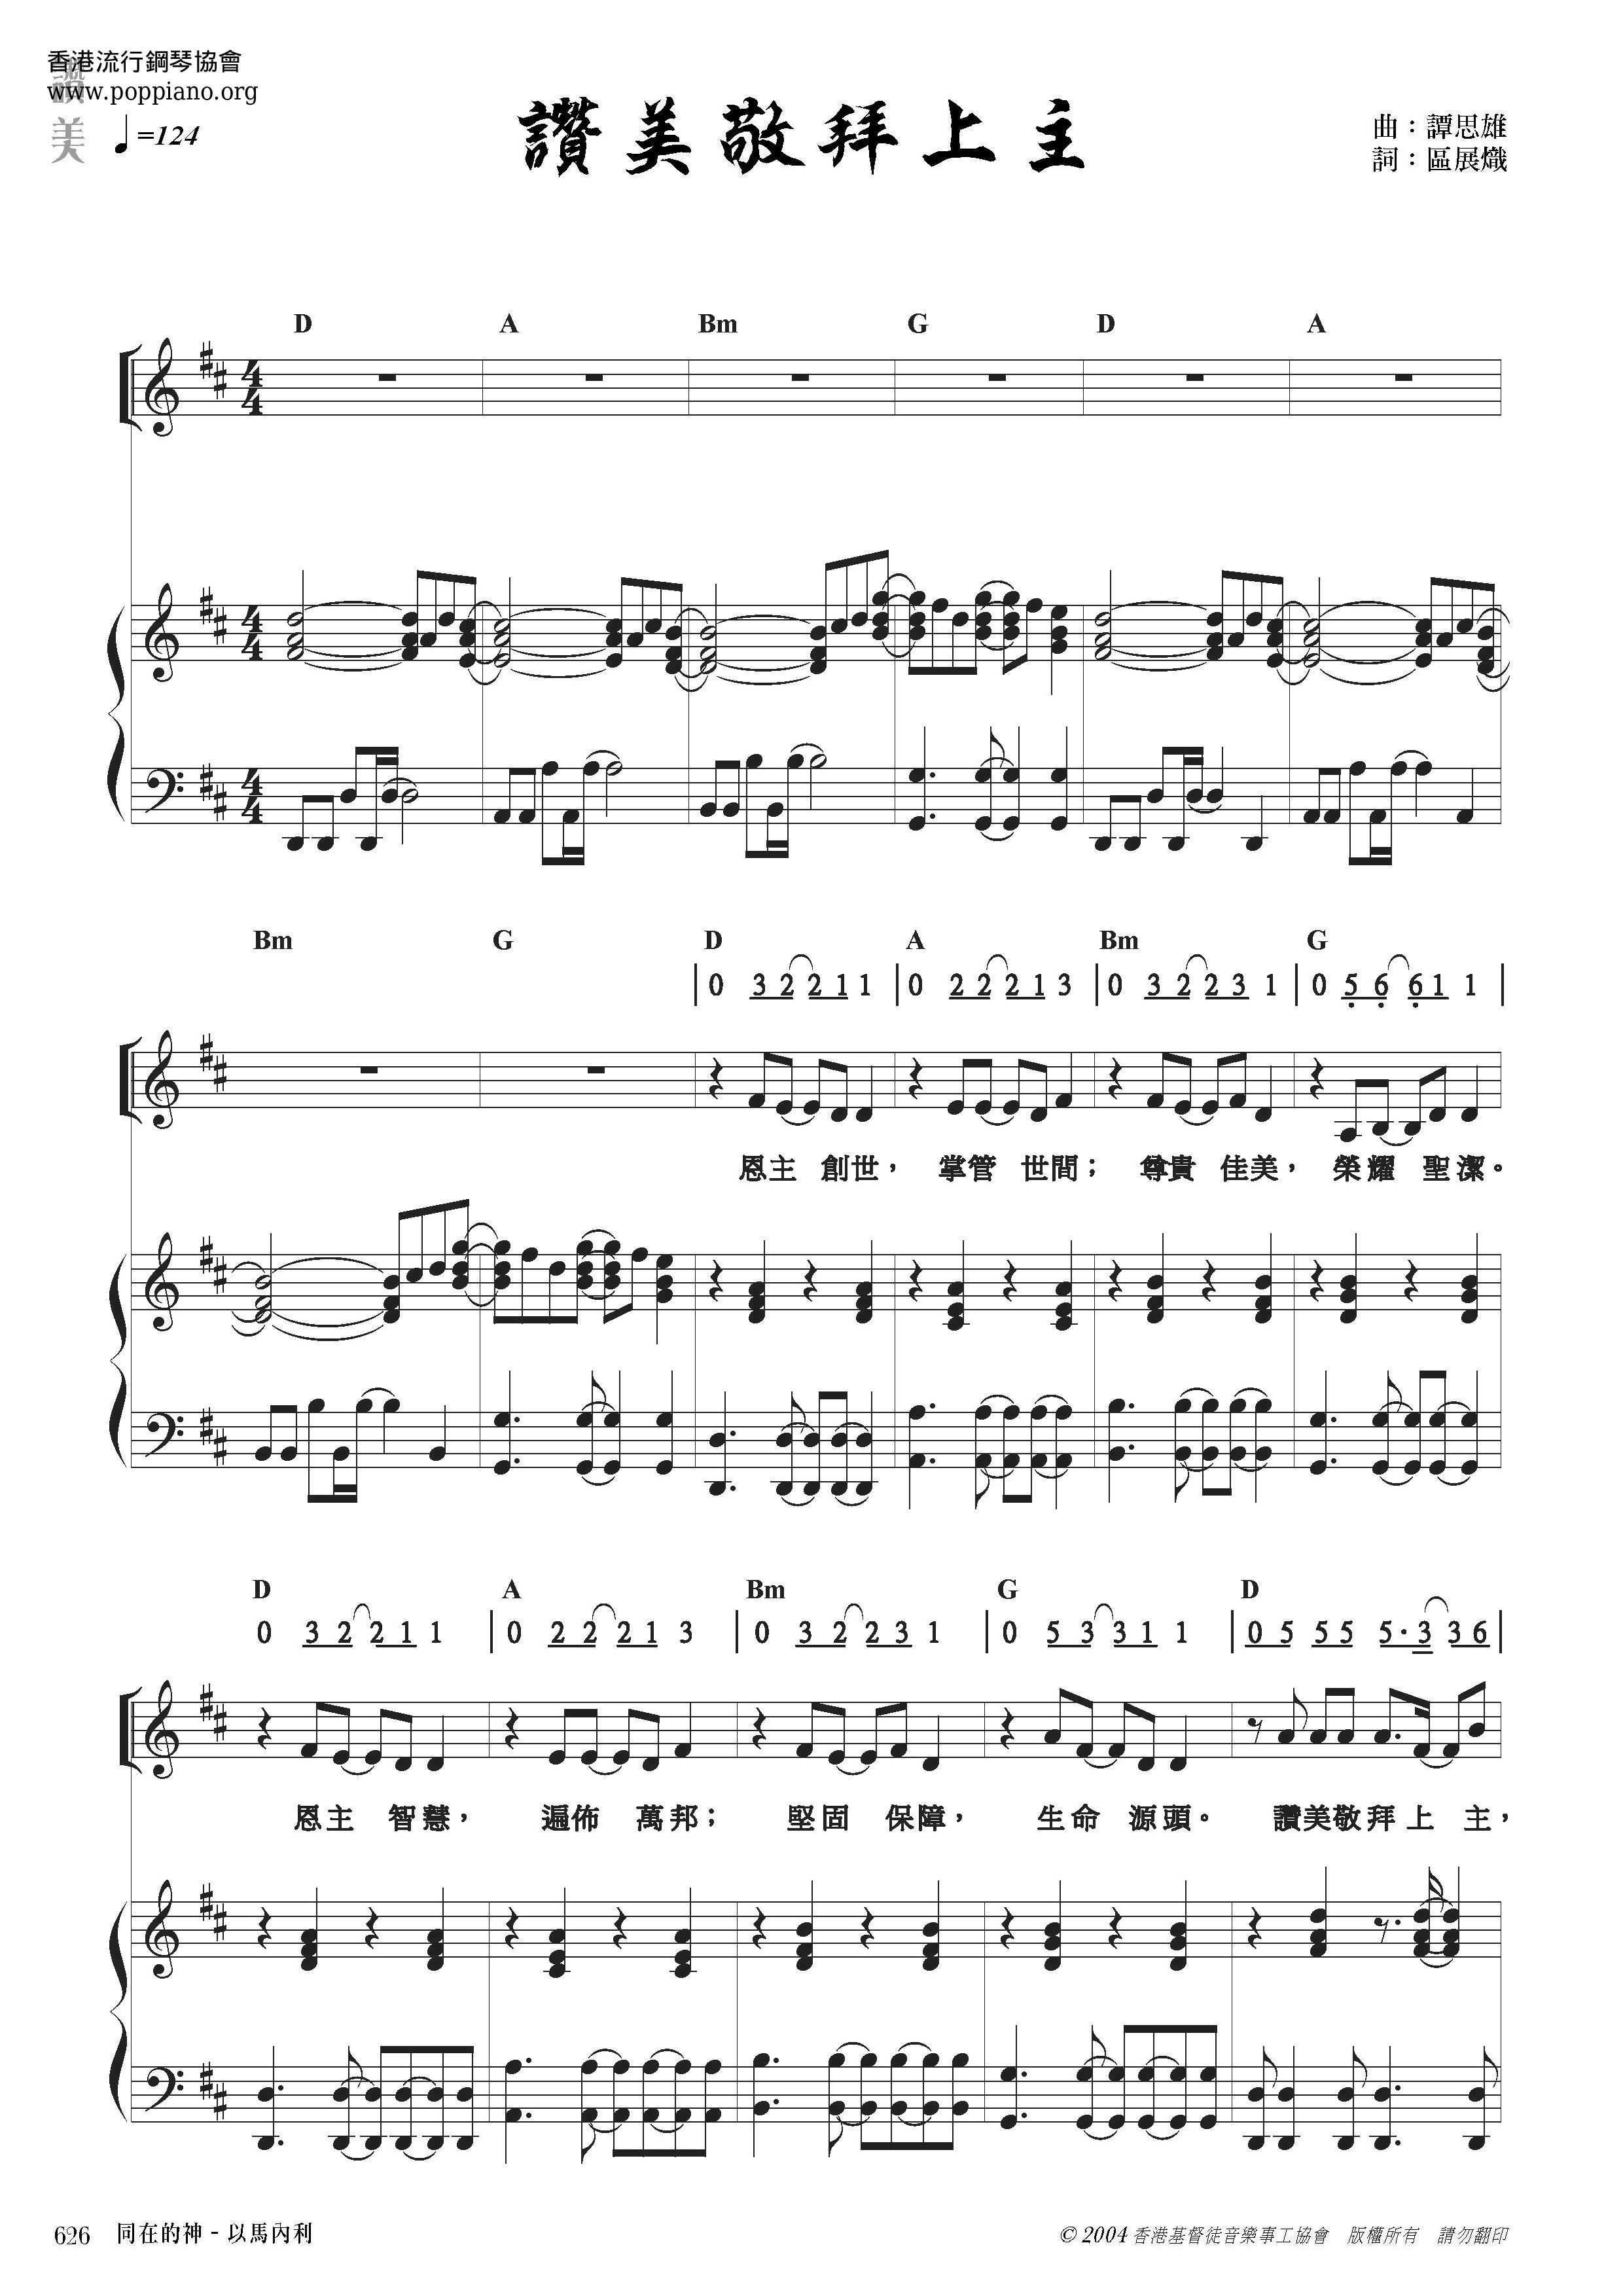 Hymn Praise And Worship The Lord Sheet Music Pdf Free Score Download